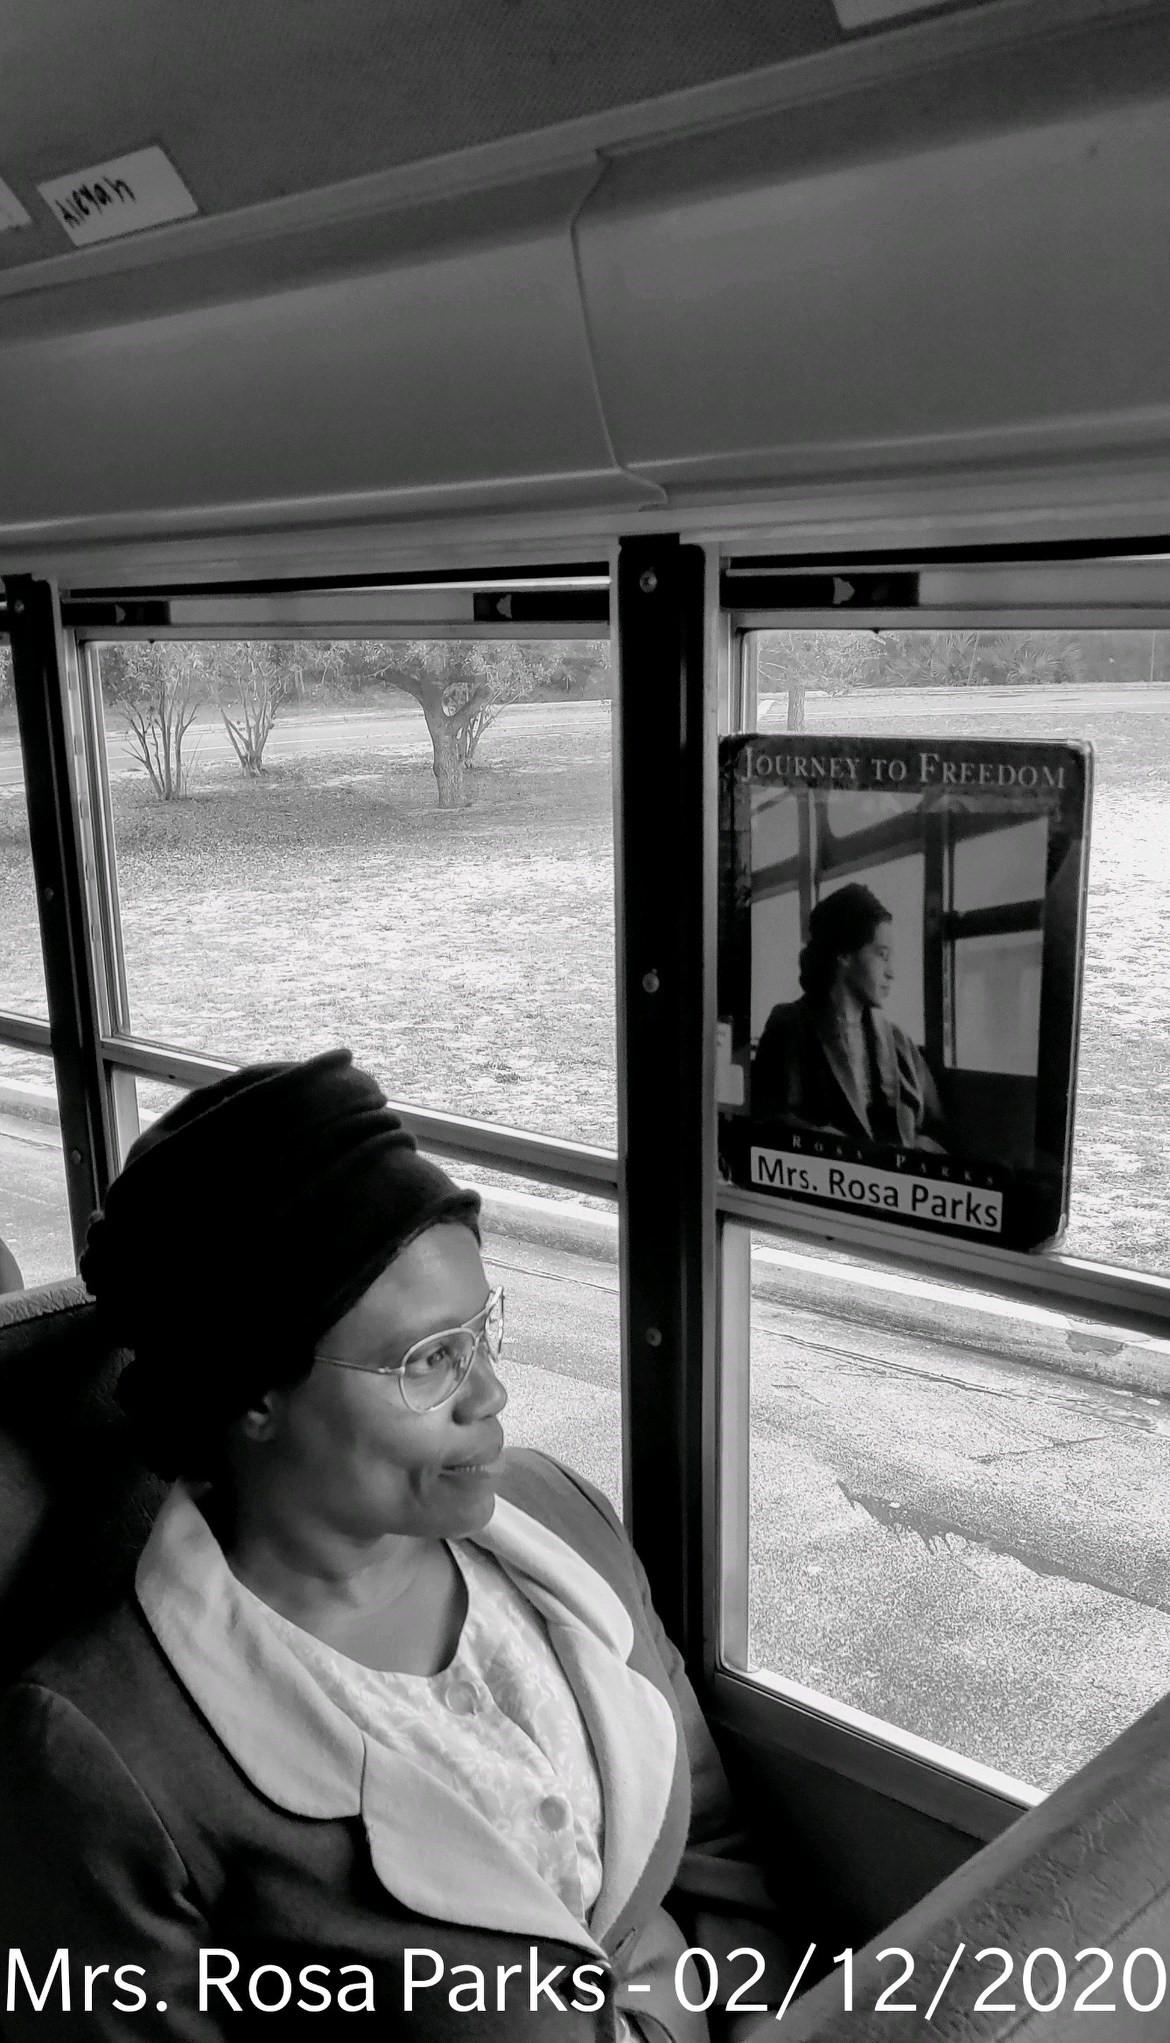 Angela Riley-Maxwel dressed as Rosa Parks